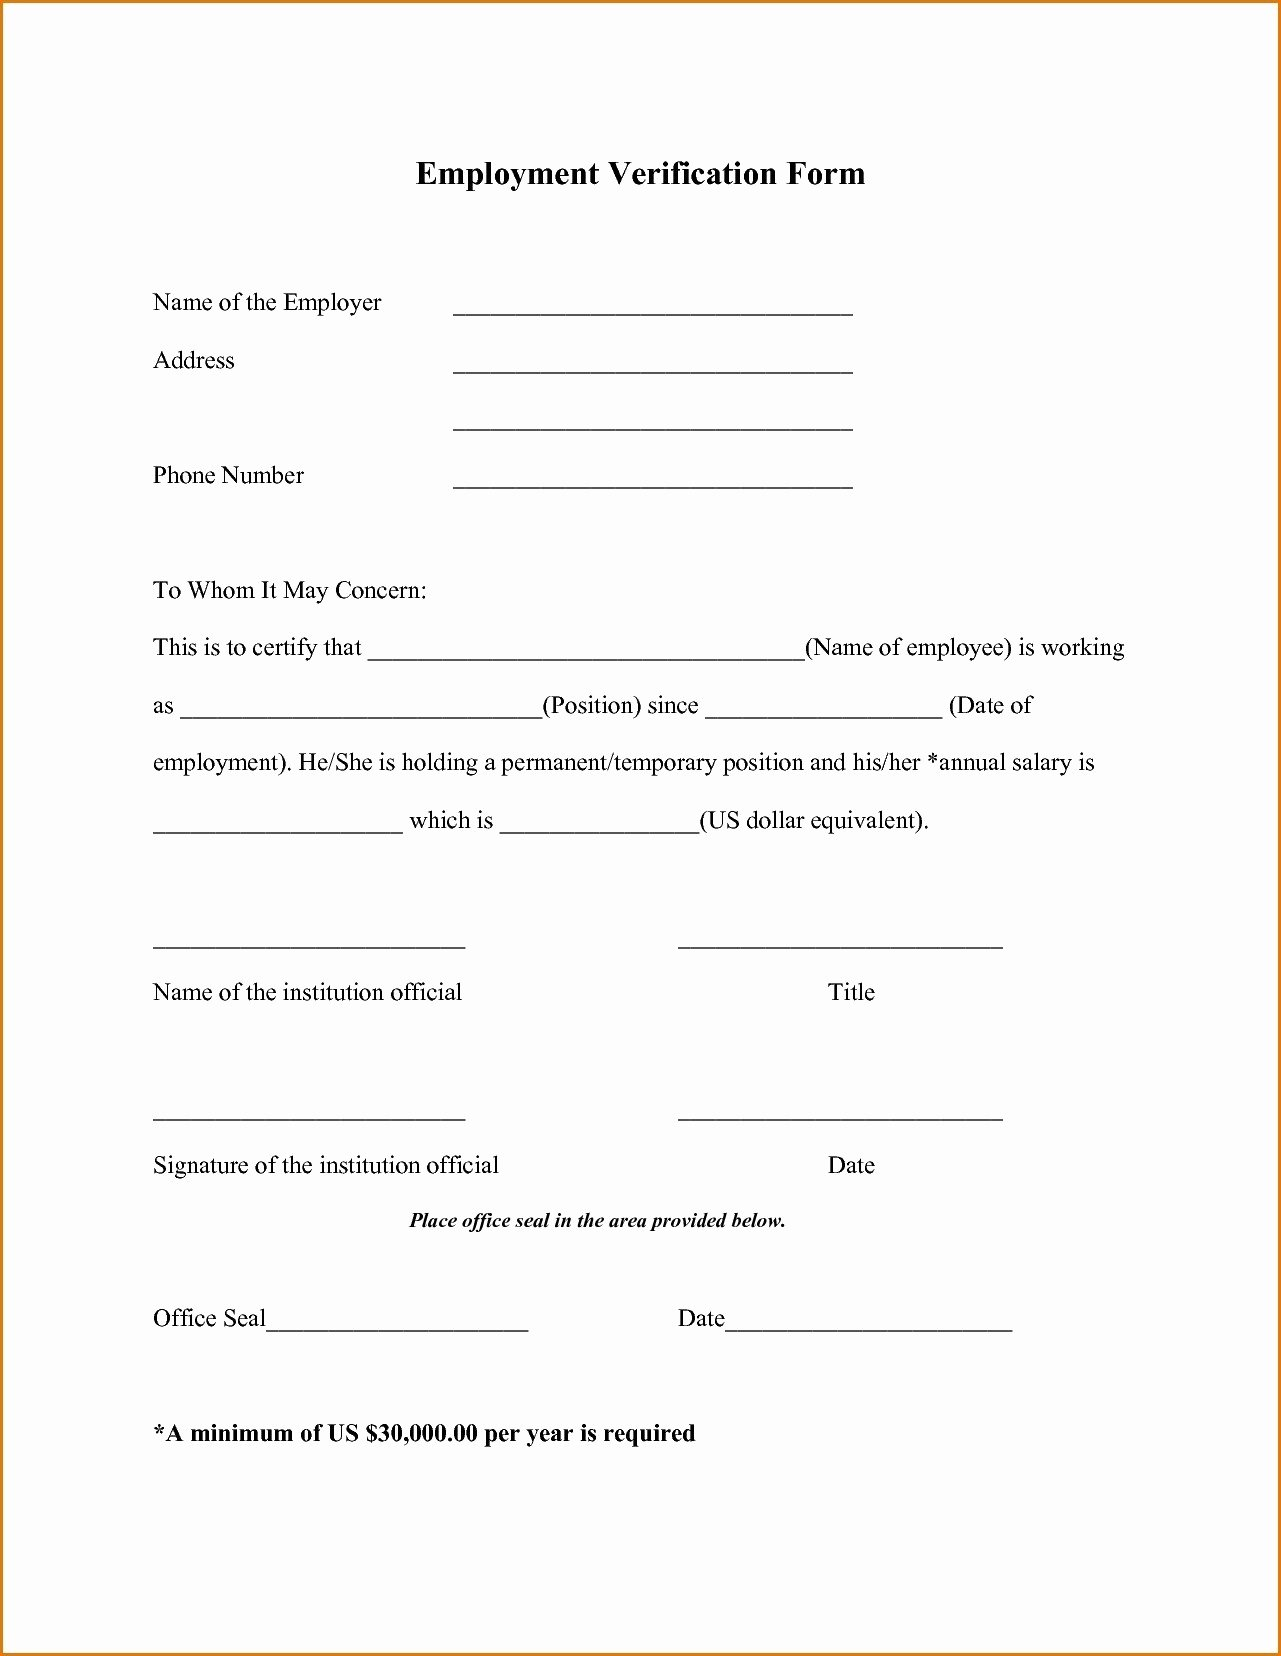 Employment Verification form Template Inspirational Employment Verification forms Template Pics – Employee